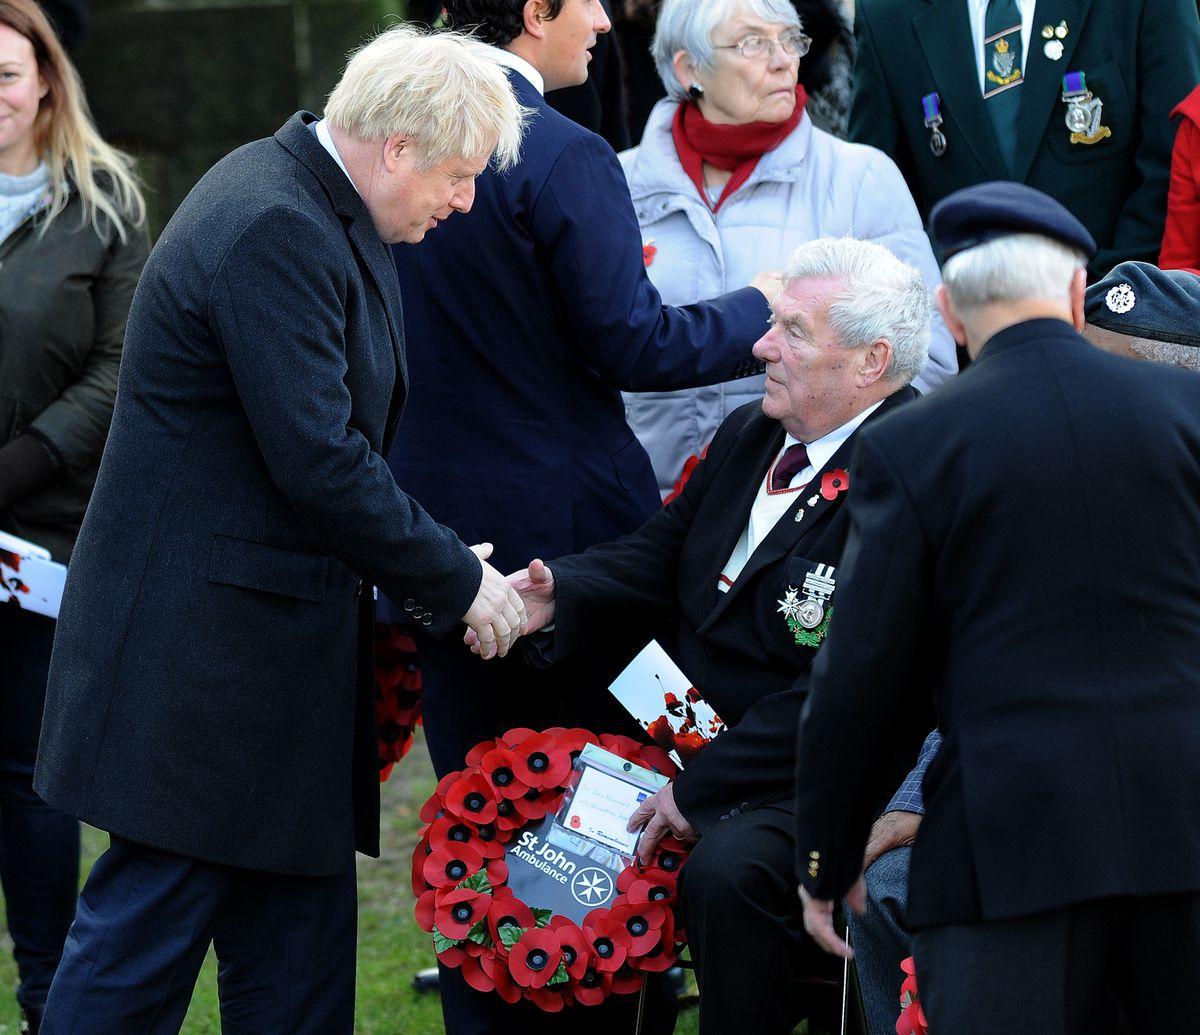 WOLVERHAMPTON COPYRIGHT EXPRESS&STAR TIM THURSFIELD 10/11/19.Prime Minister Boris Johnson visits Wolverhampton for the Armistice service, a visit to Express & Star HQ and then a visit to the Lych Gate Tavern..